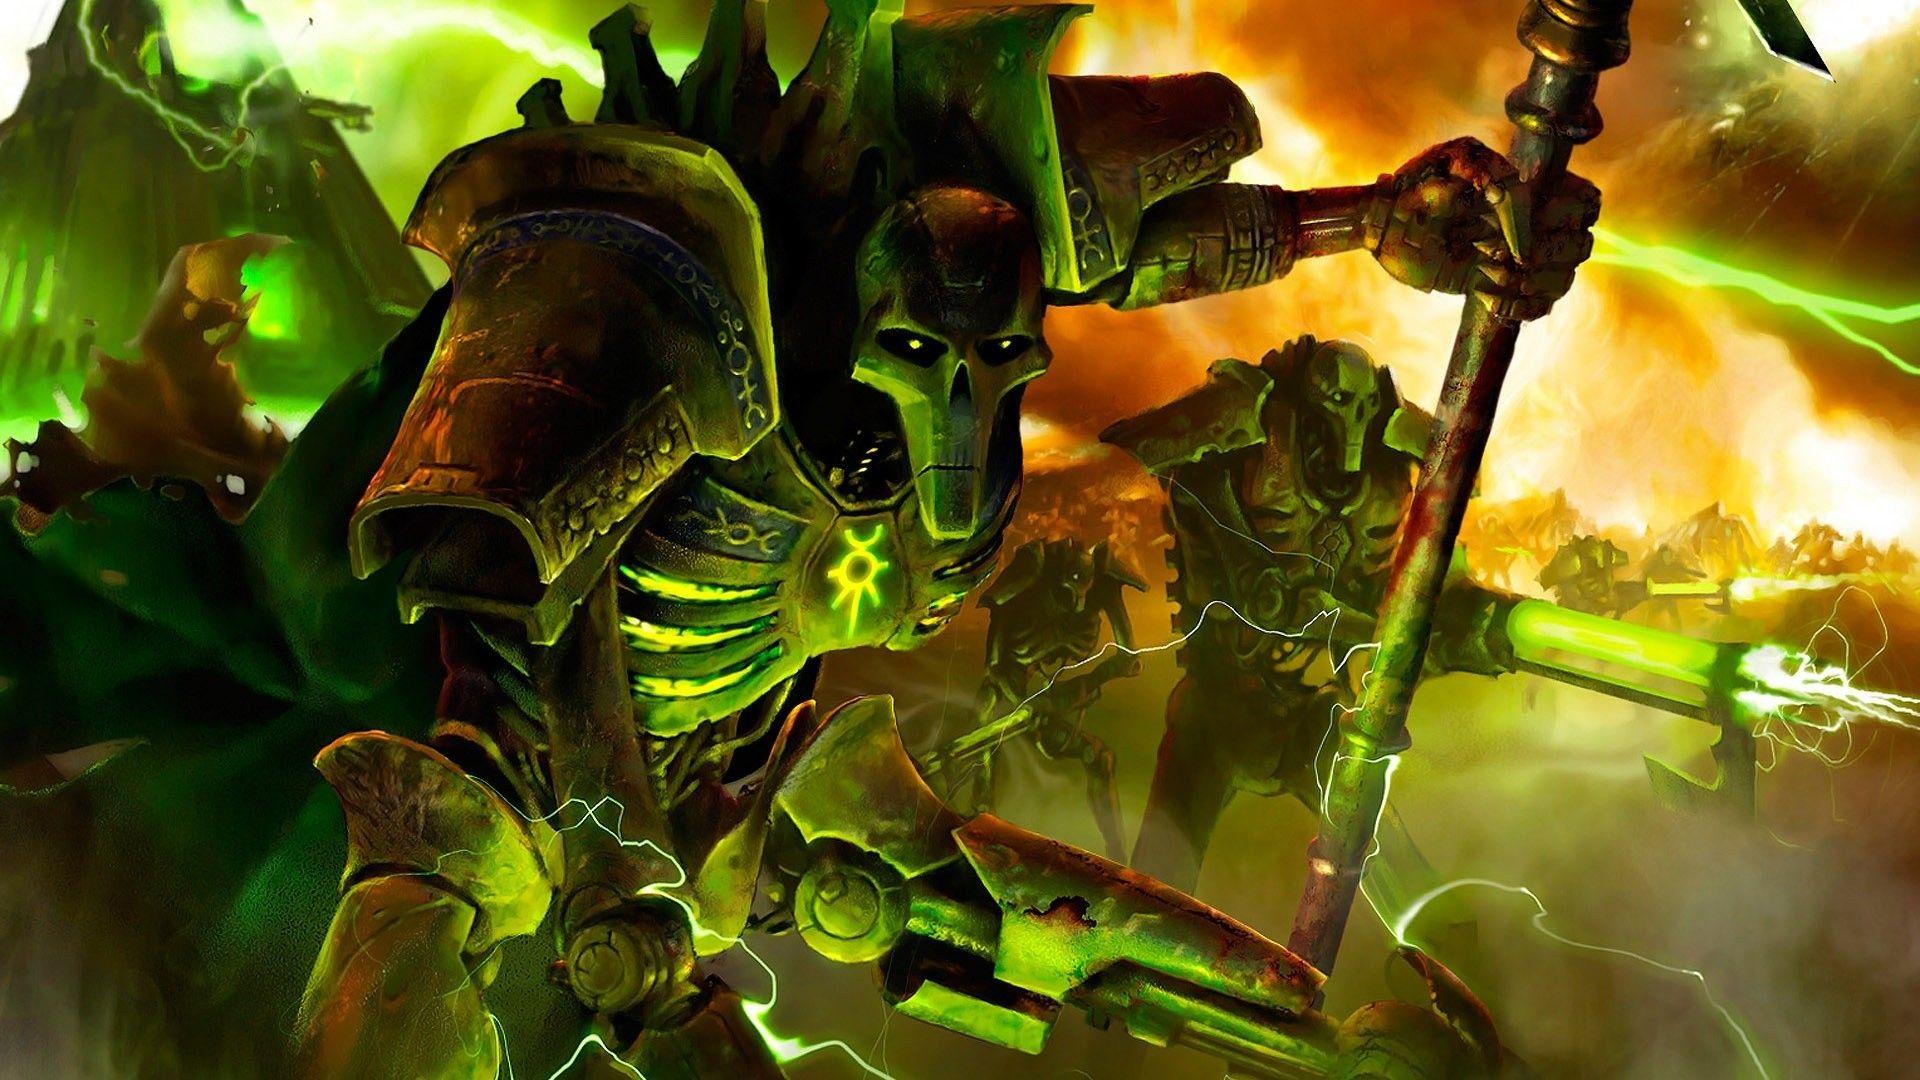 Necrons Warhammer 40k Wallpaper